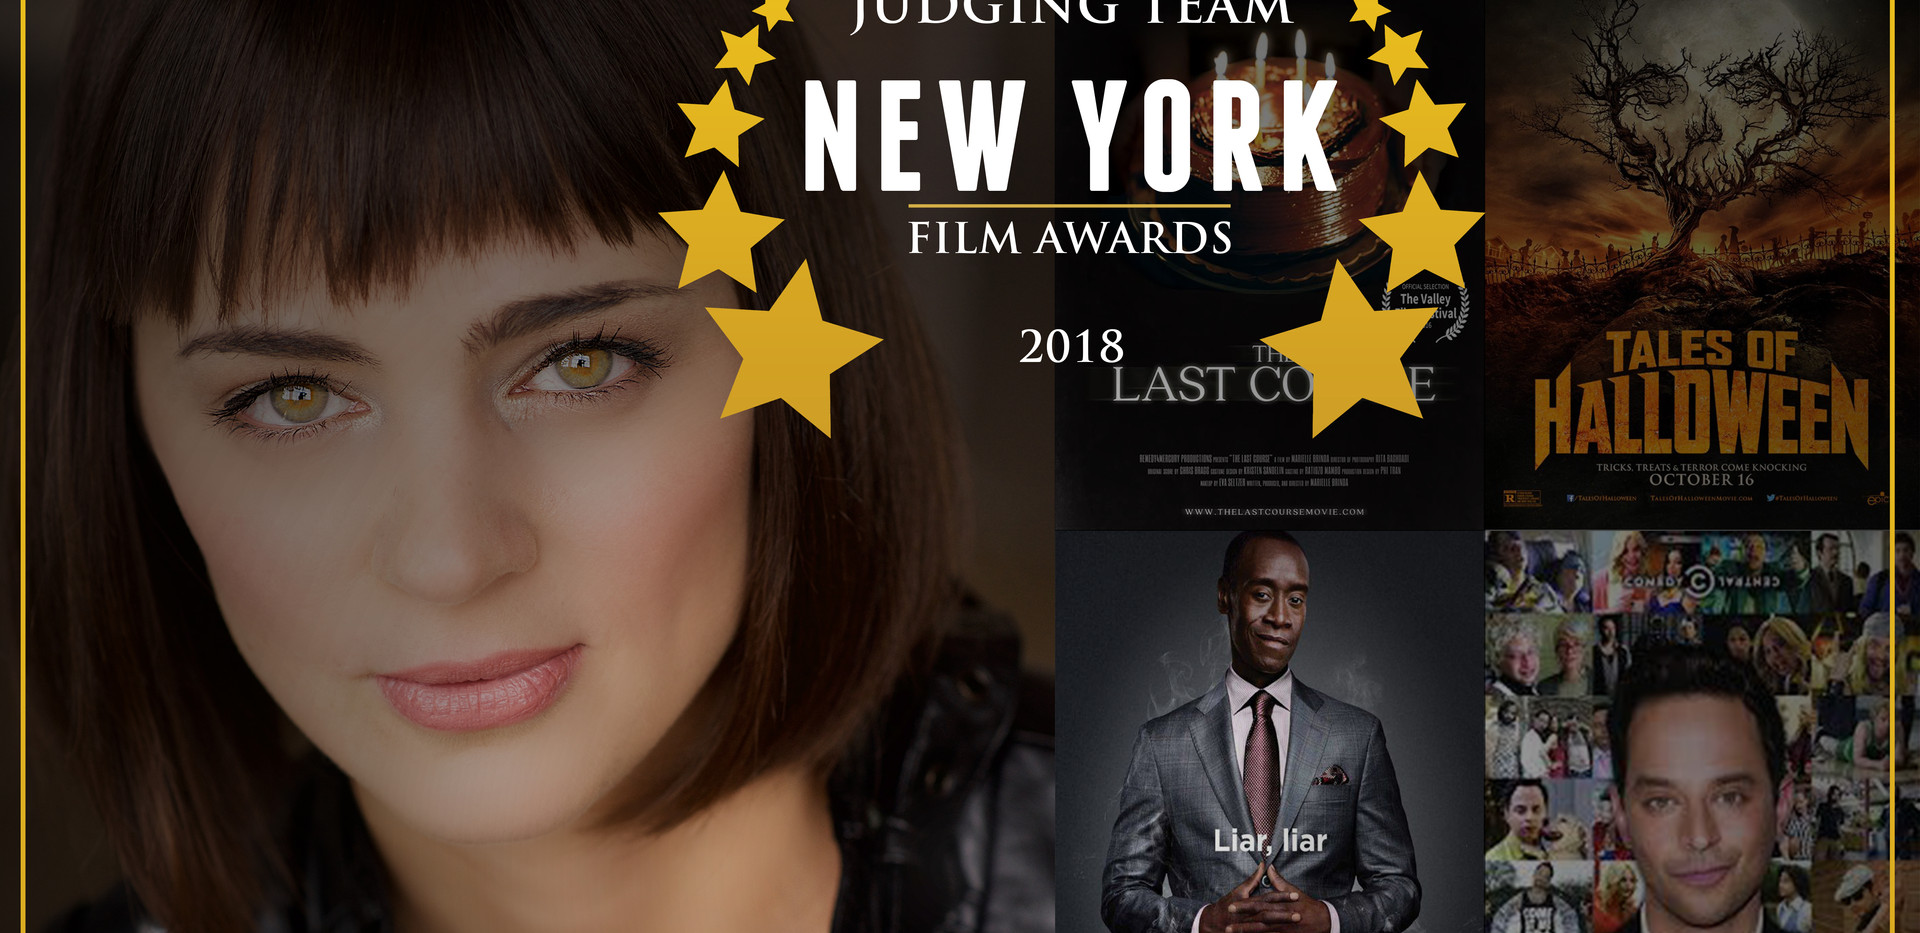 New York Film Awards 2018 Annual Casey R